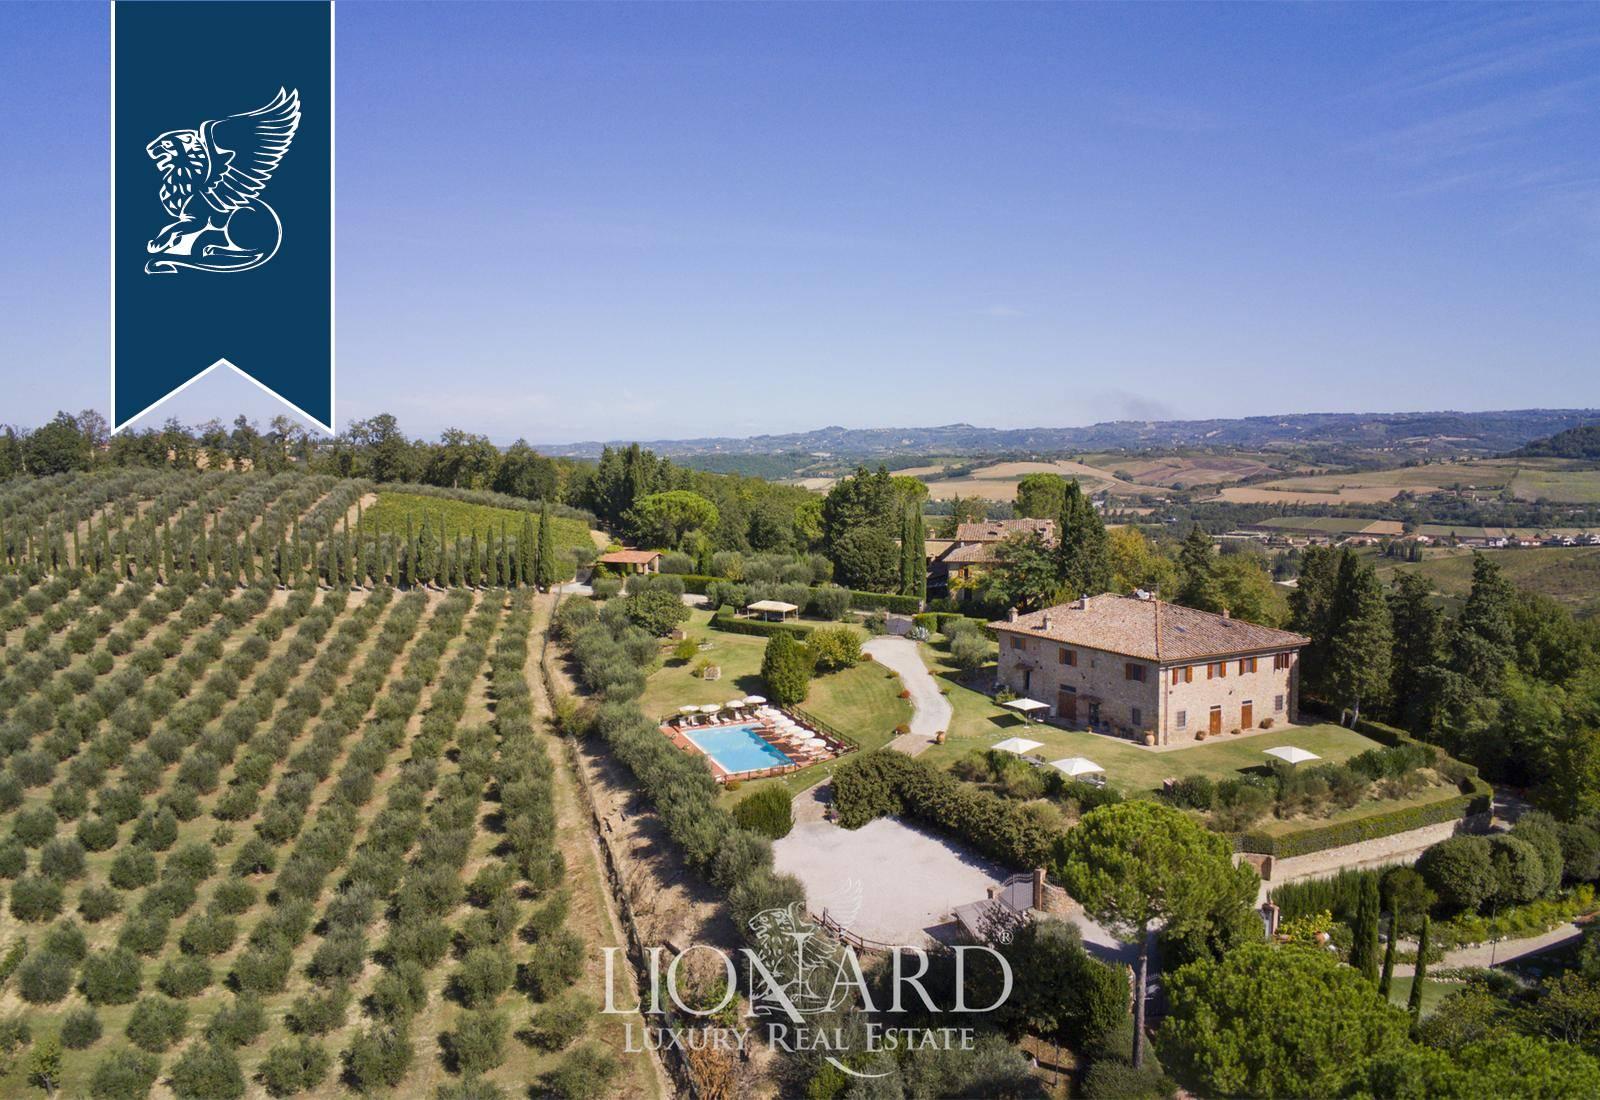 Agriturismo in Vendita a San Gimignano: 0 locali, 900 mq - Foto 4